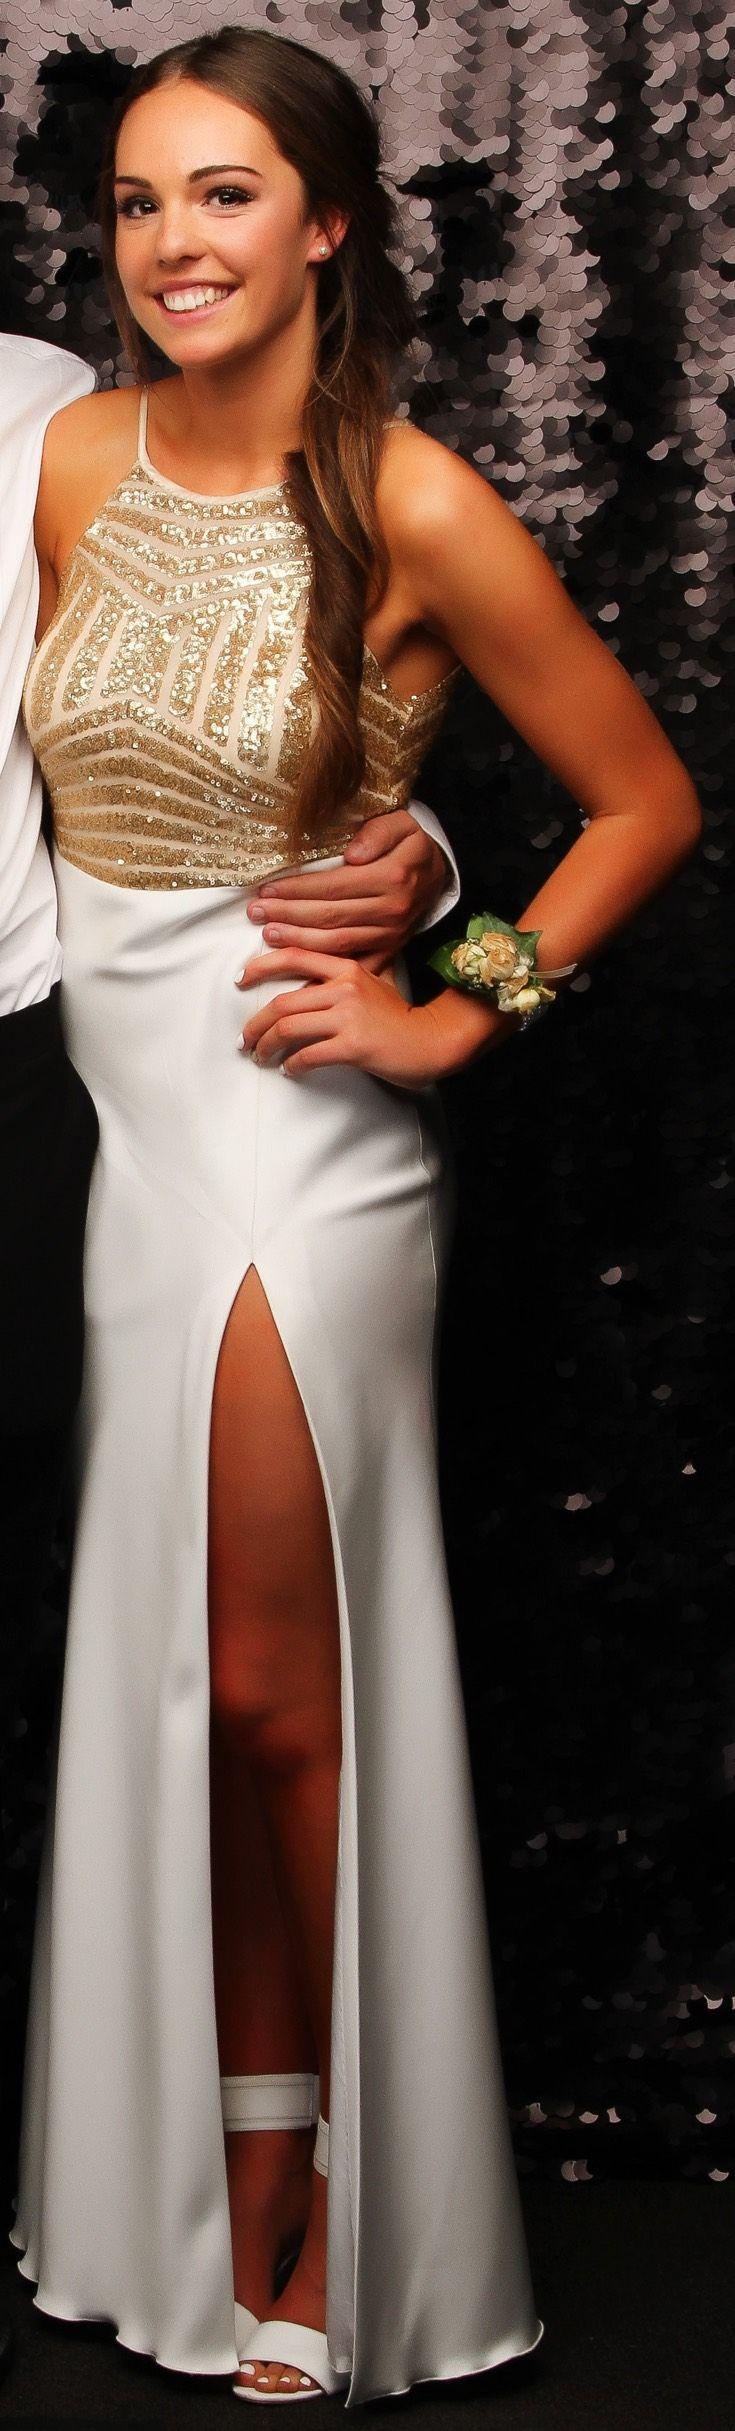 St Kentigern College Ball 2015. Gorgeous Grecian look! www.whitedoor.co.nz